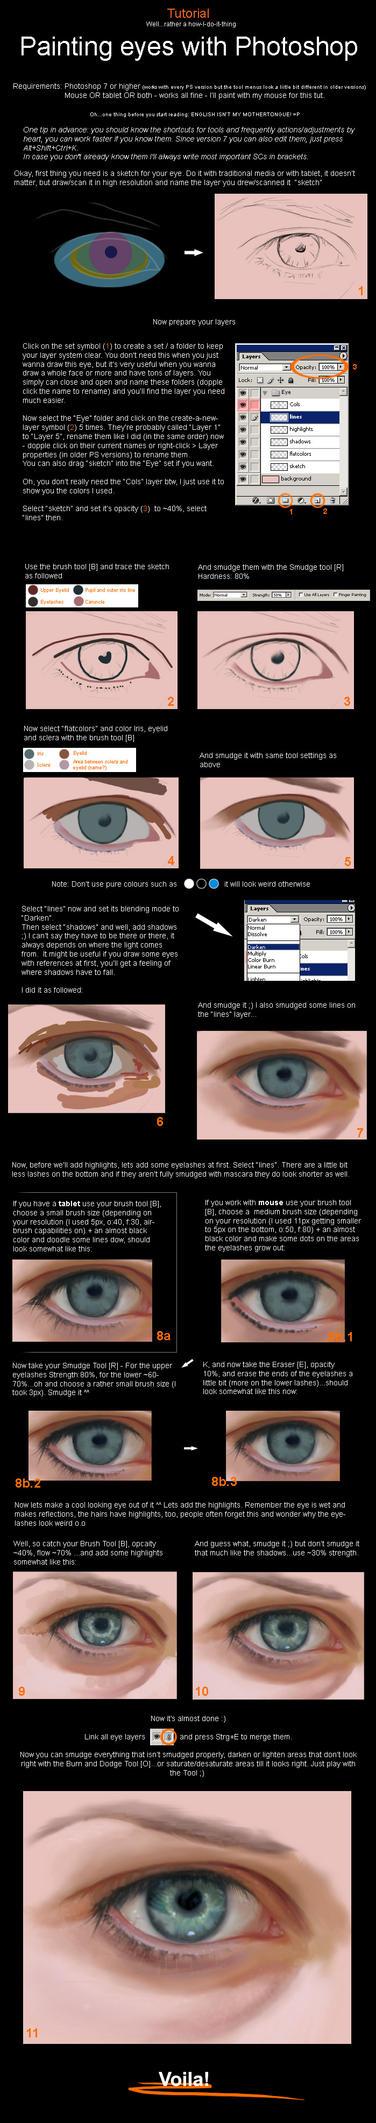 Photoshop - Painting an Eye by sirasan